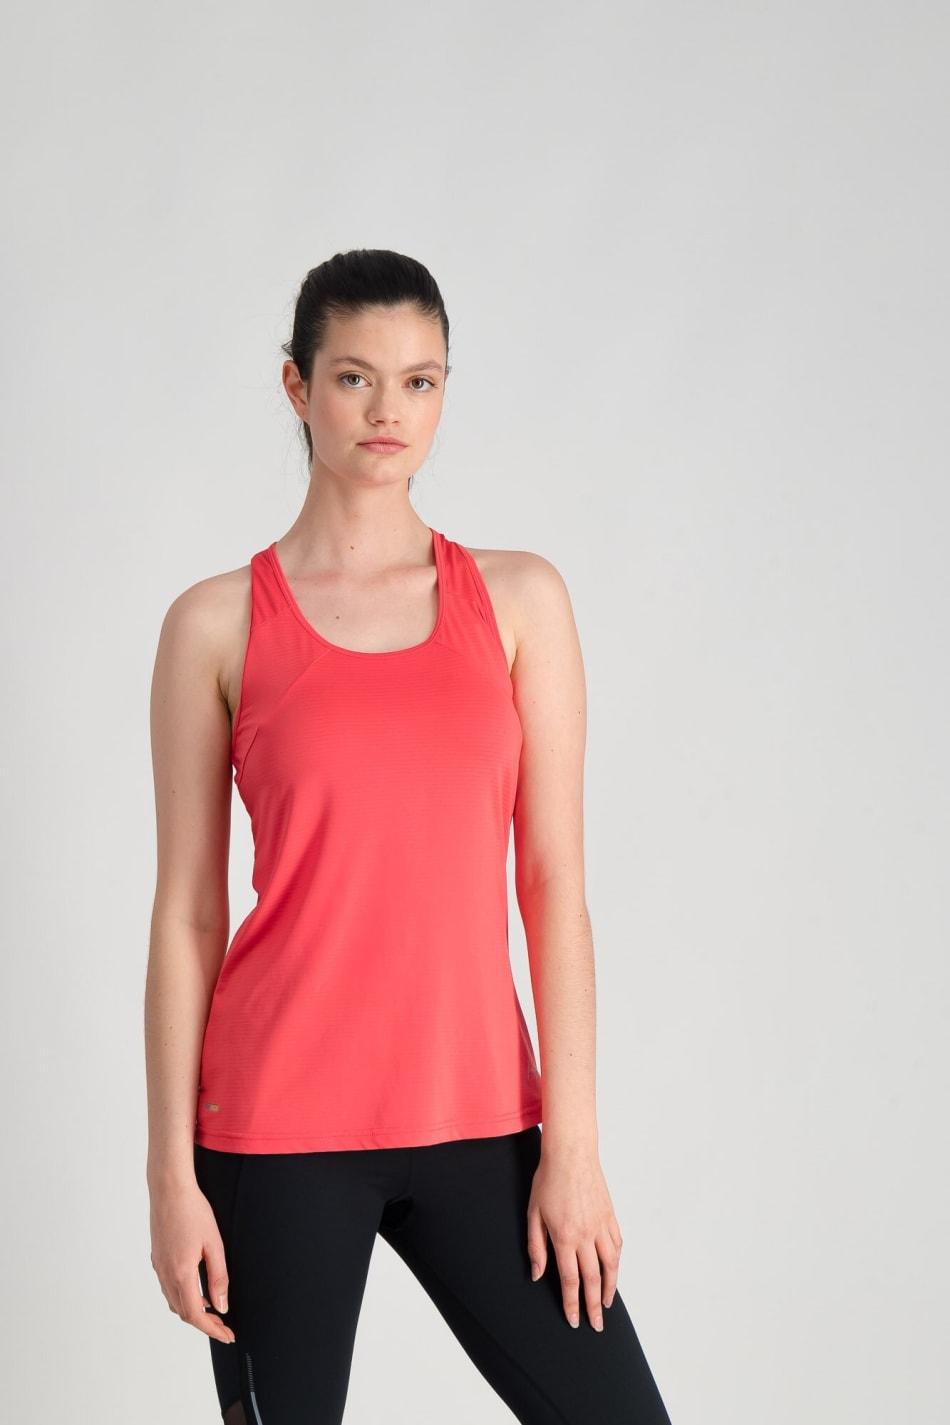 Capestorm Women's Stride Run Vest, product, variation 1